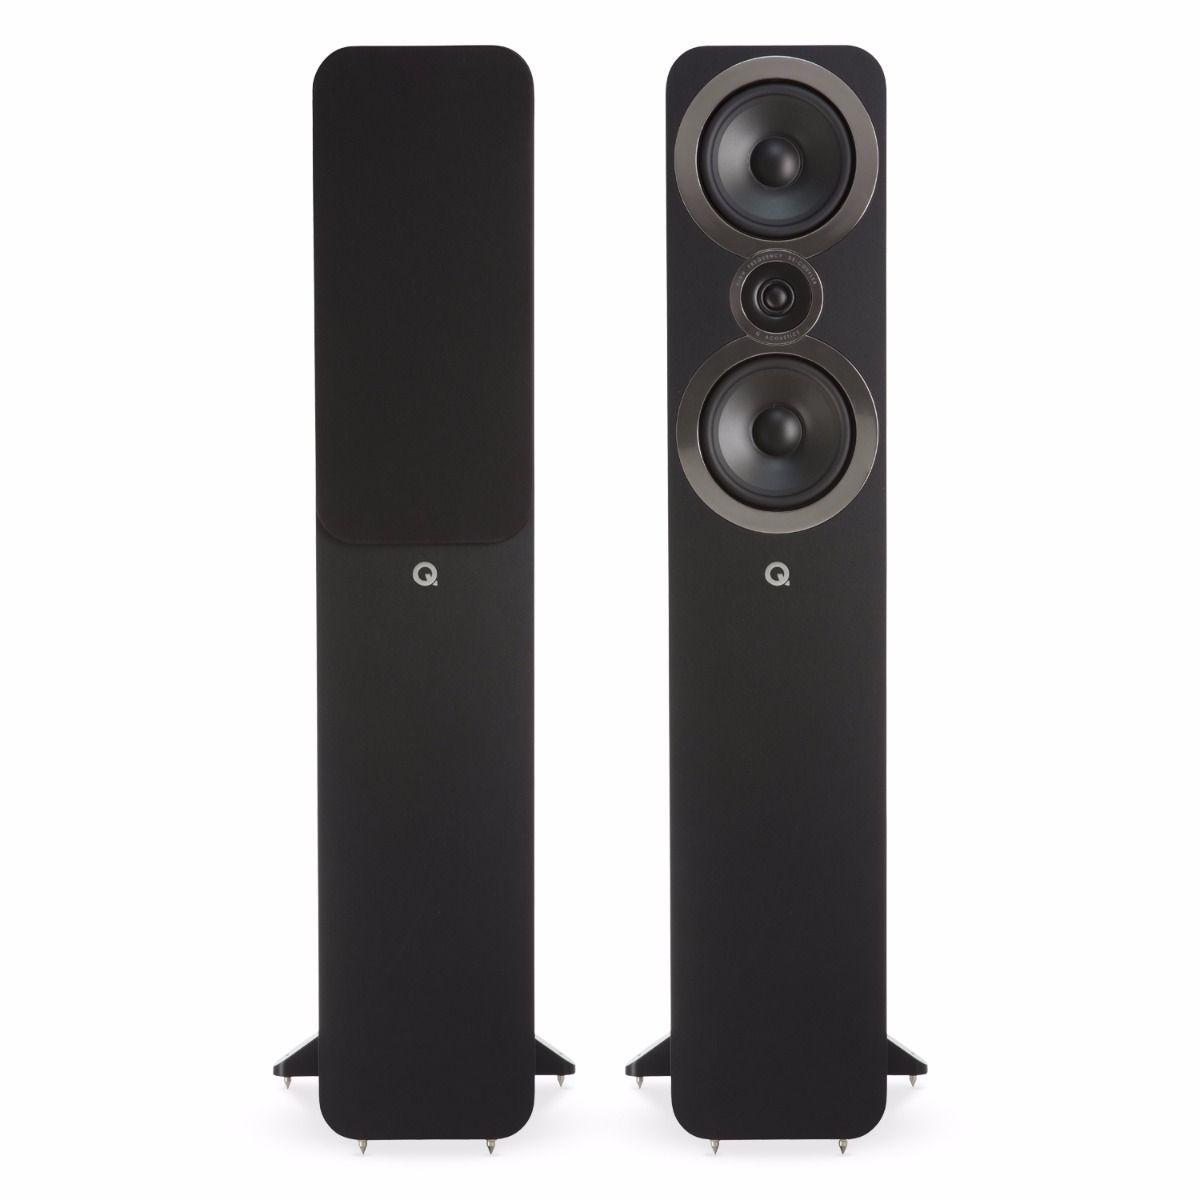 Q-Acoustics 3050i Standingfloor Speaker, black (checked return)